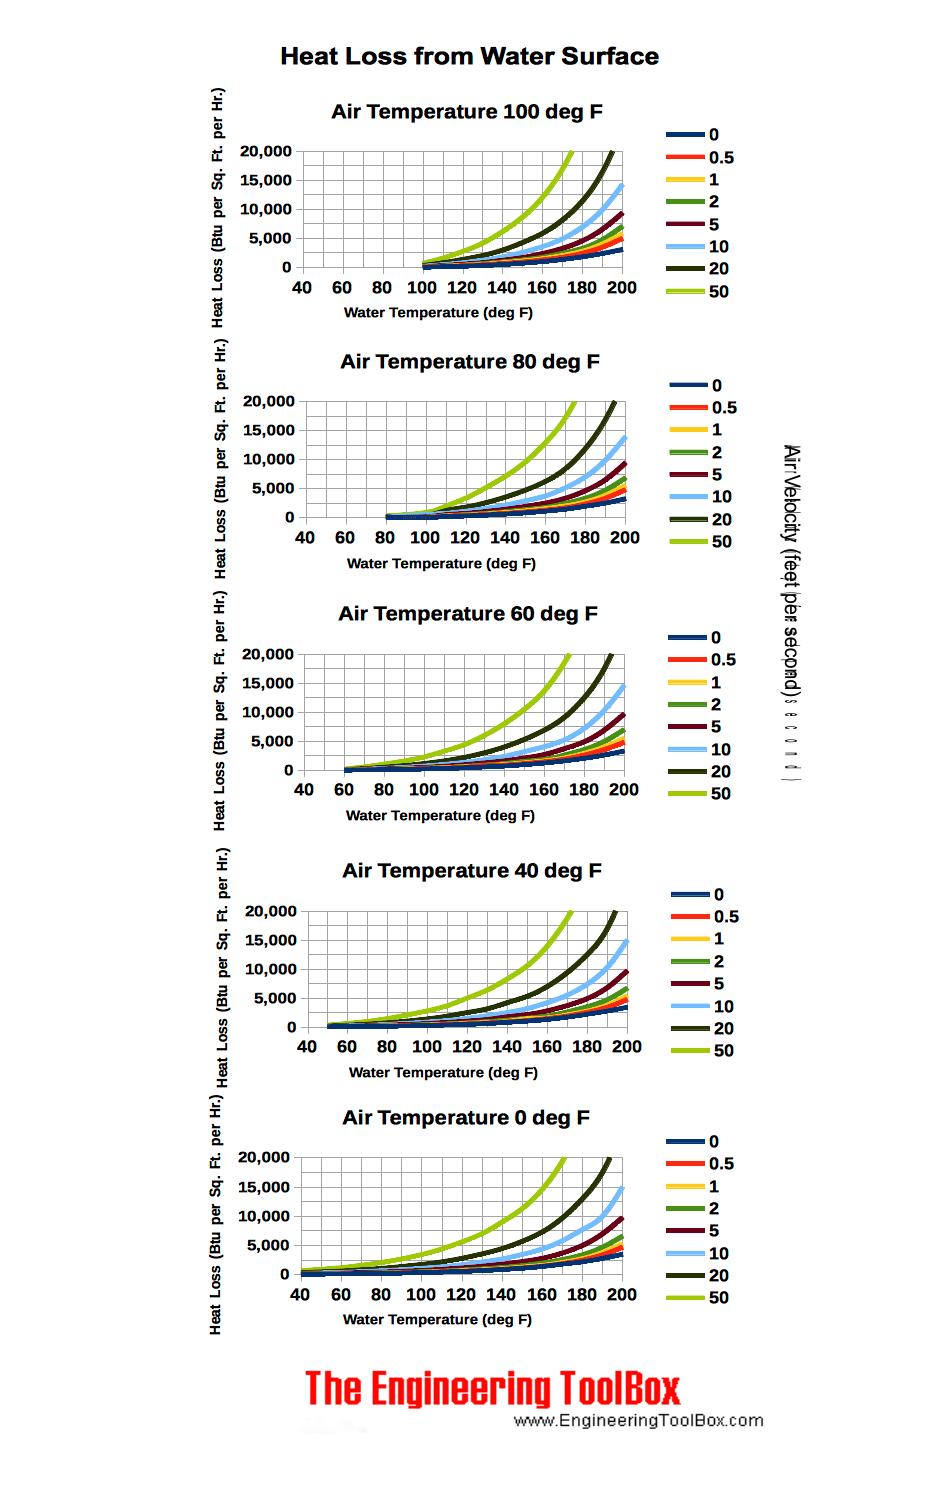 Heat loss from open tanks or swimmingpools chart